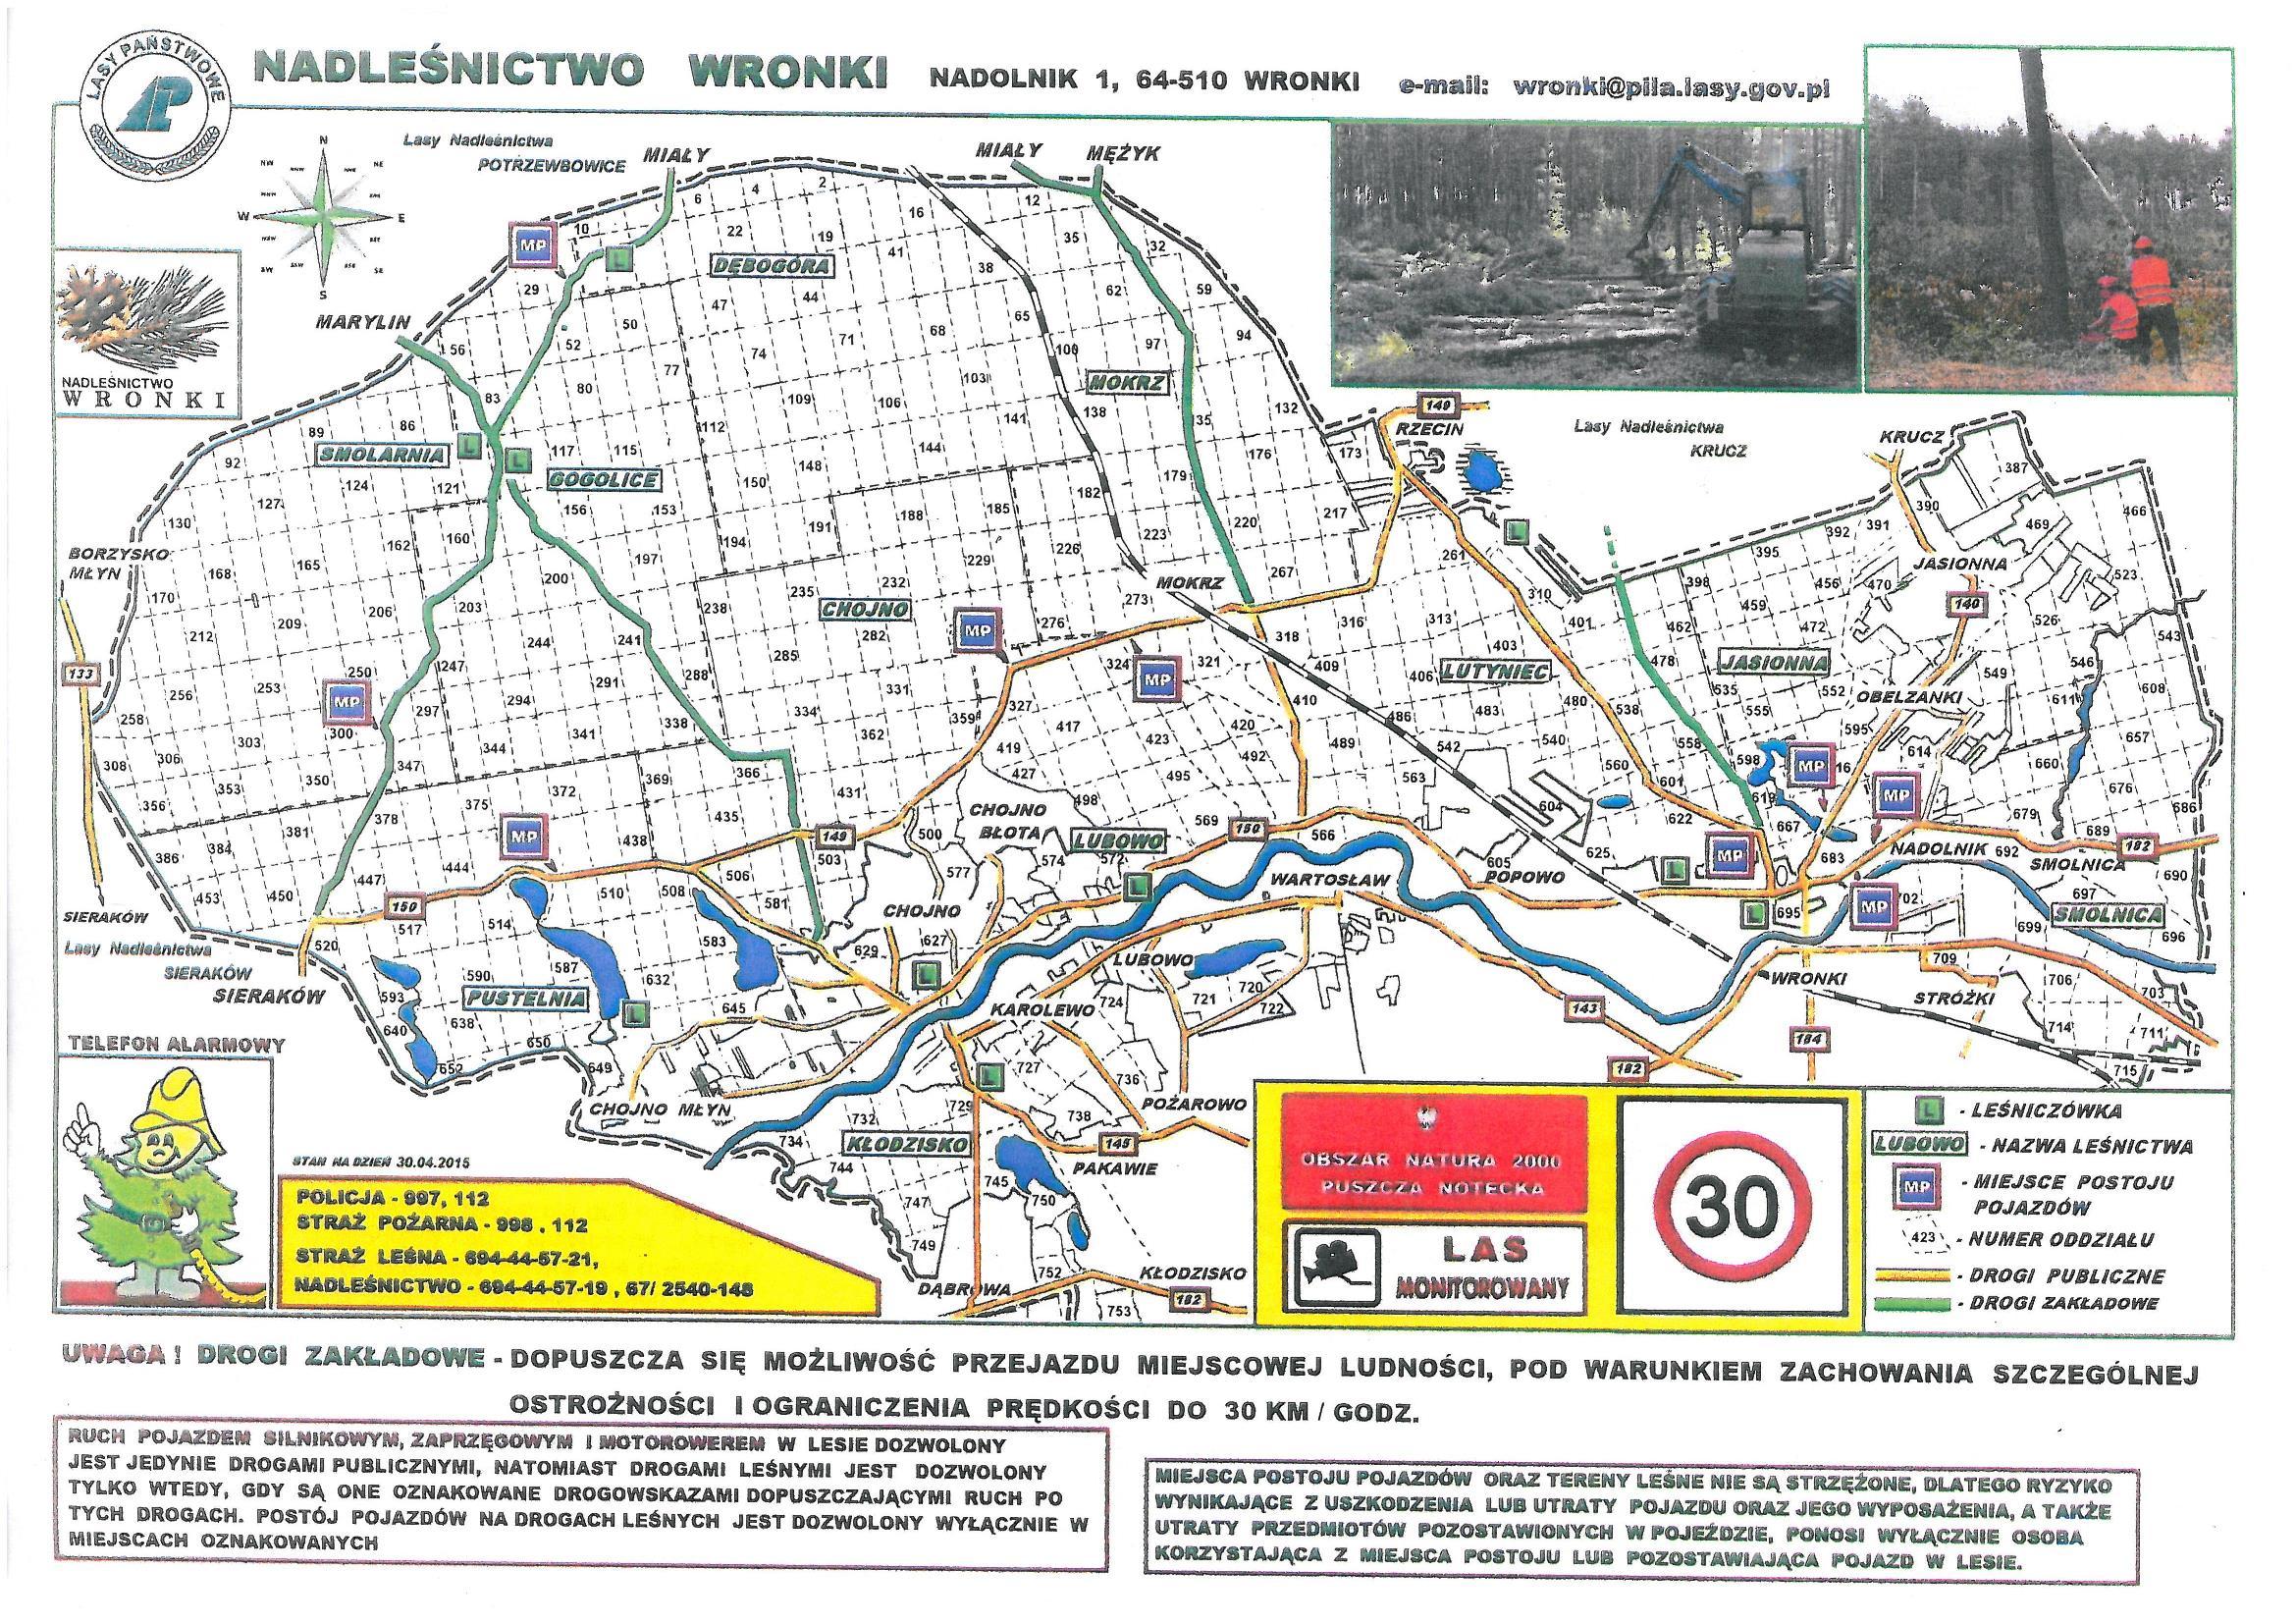 NLP Wronki 1 Mapa